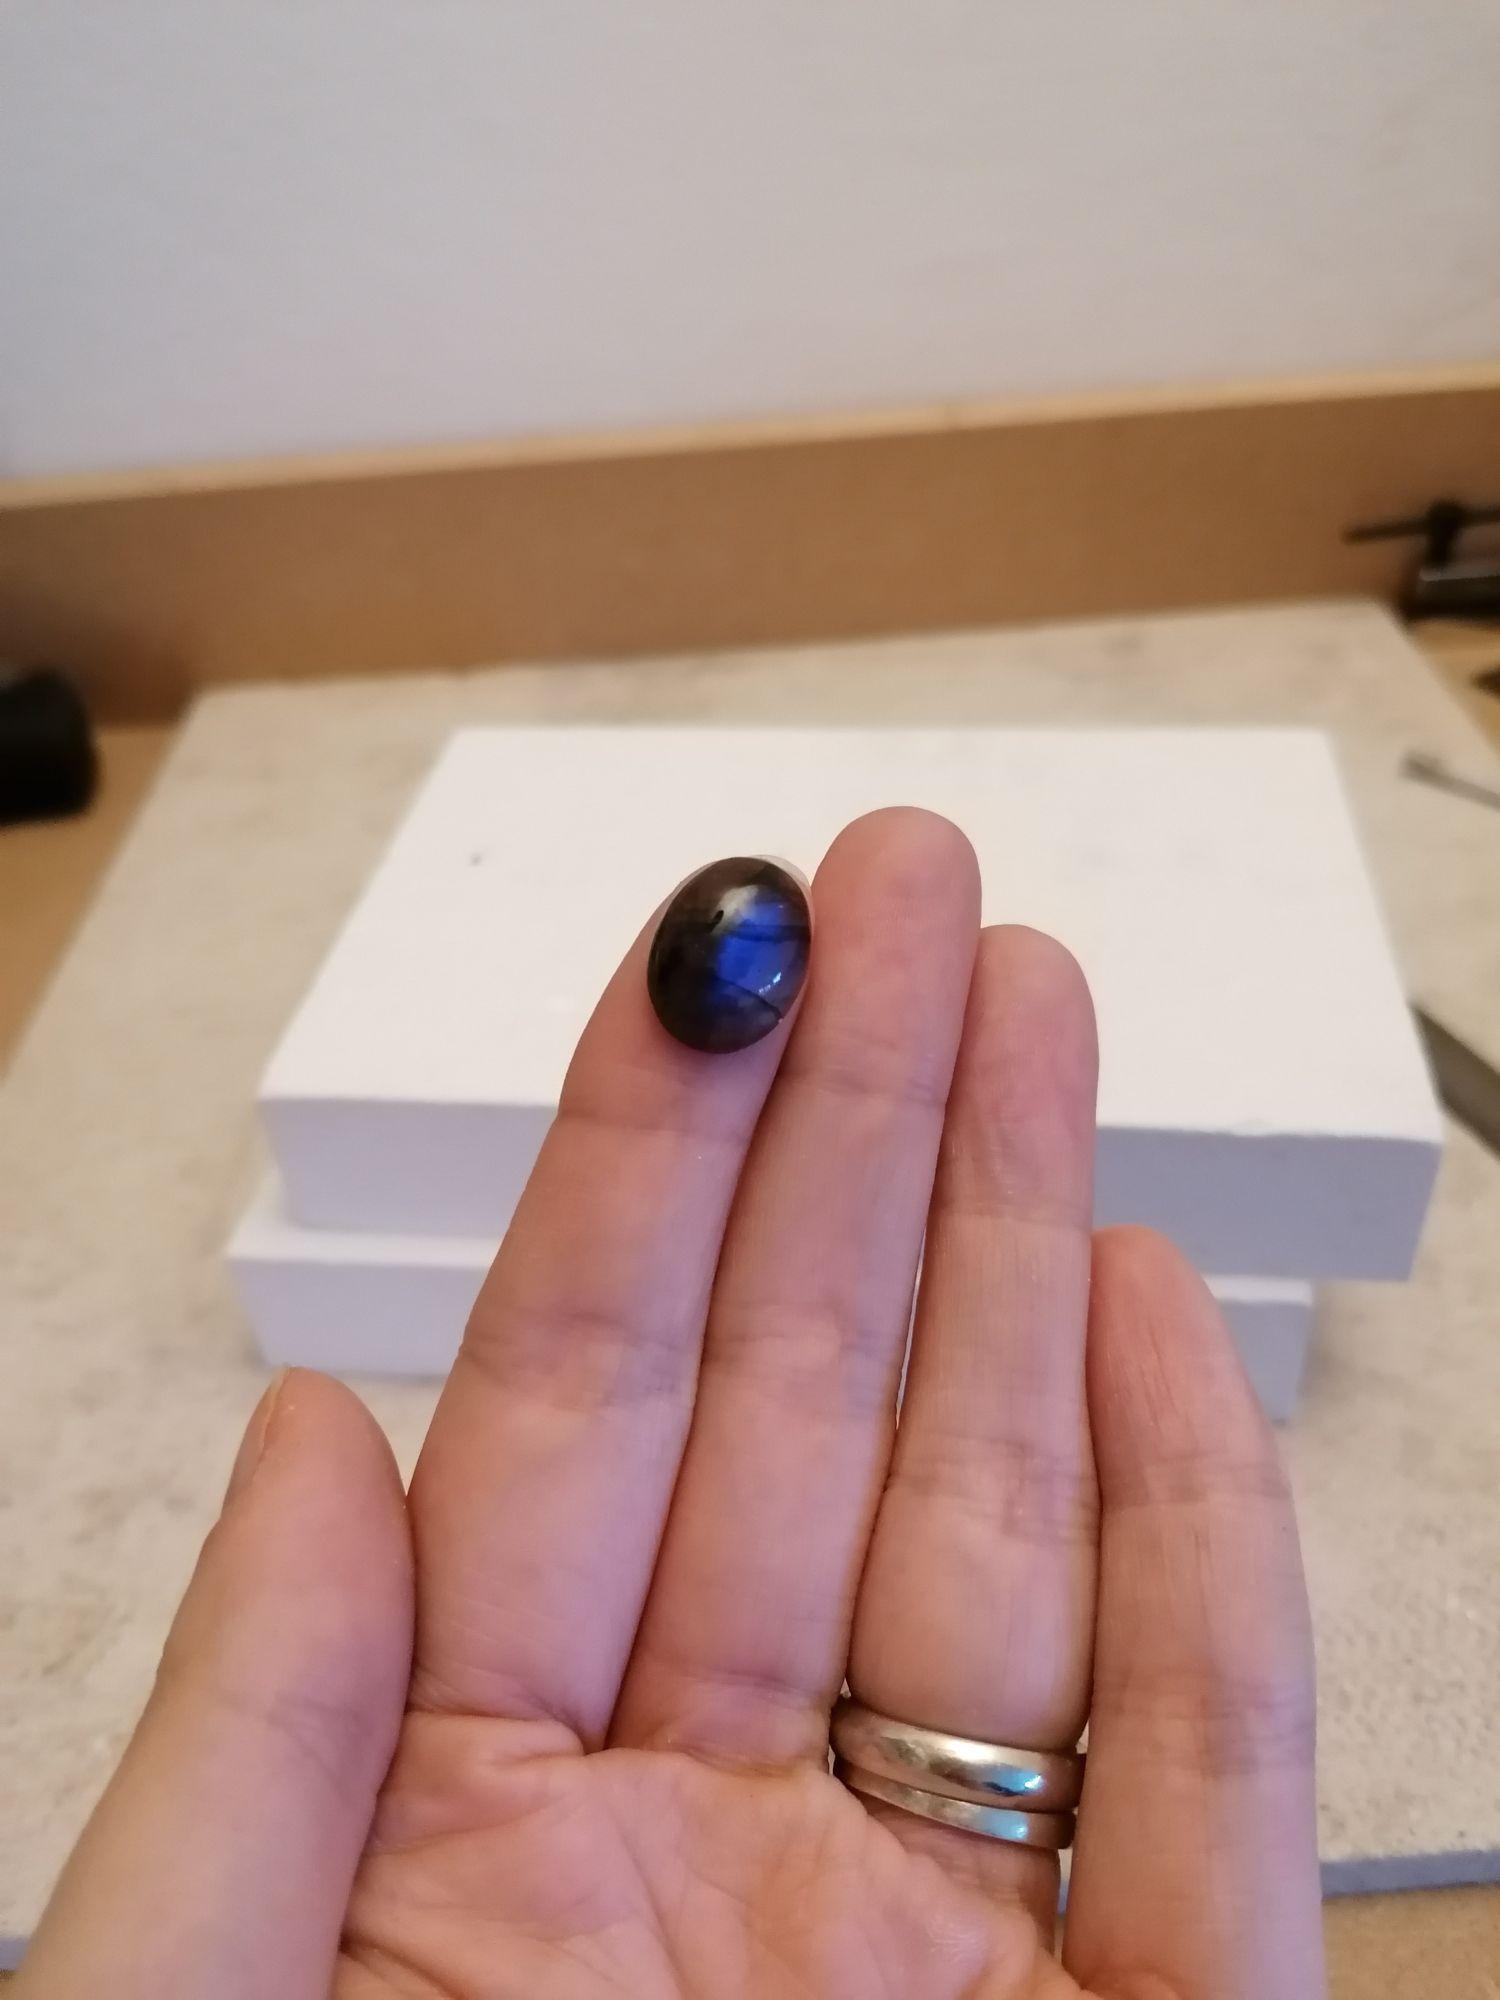 Labradorite gemstone with blue flash